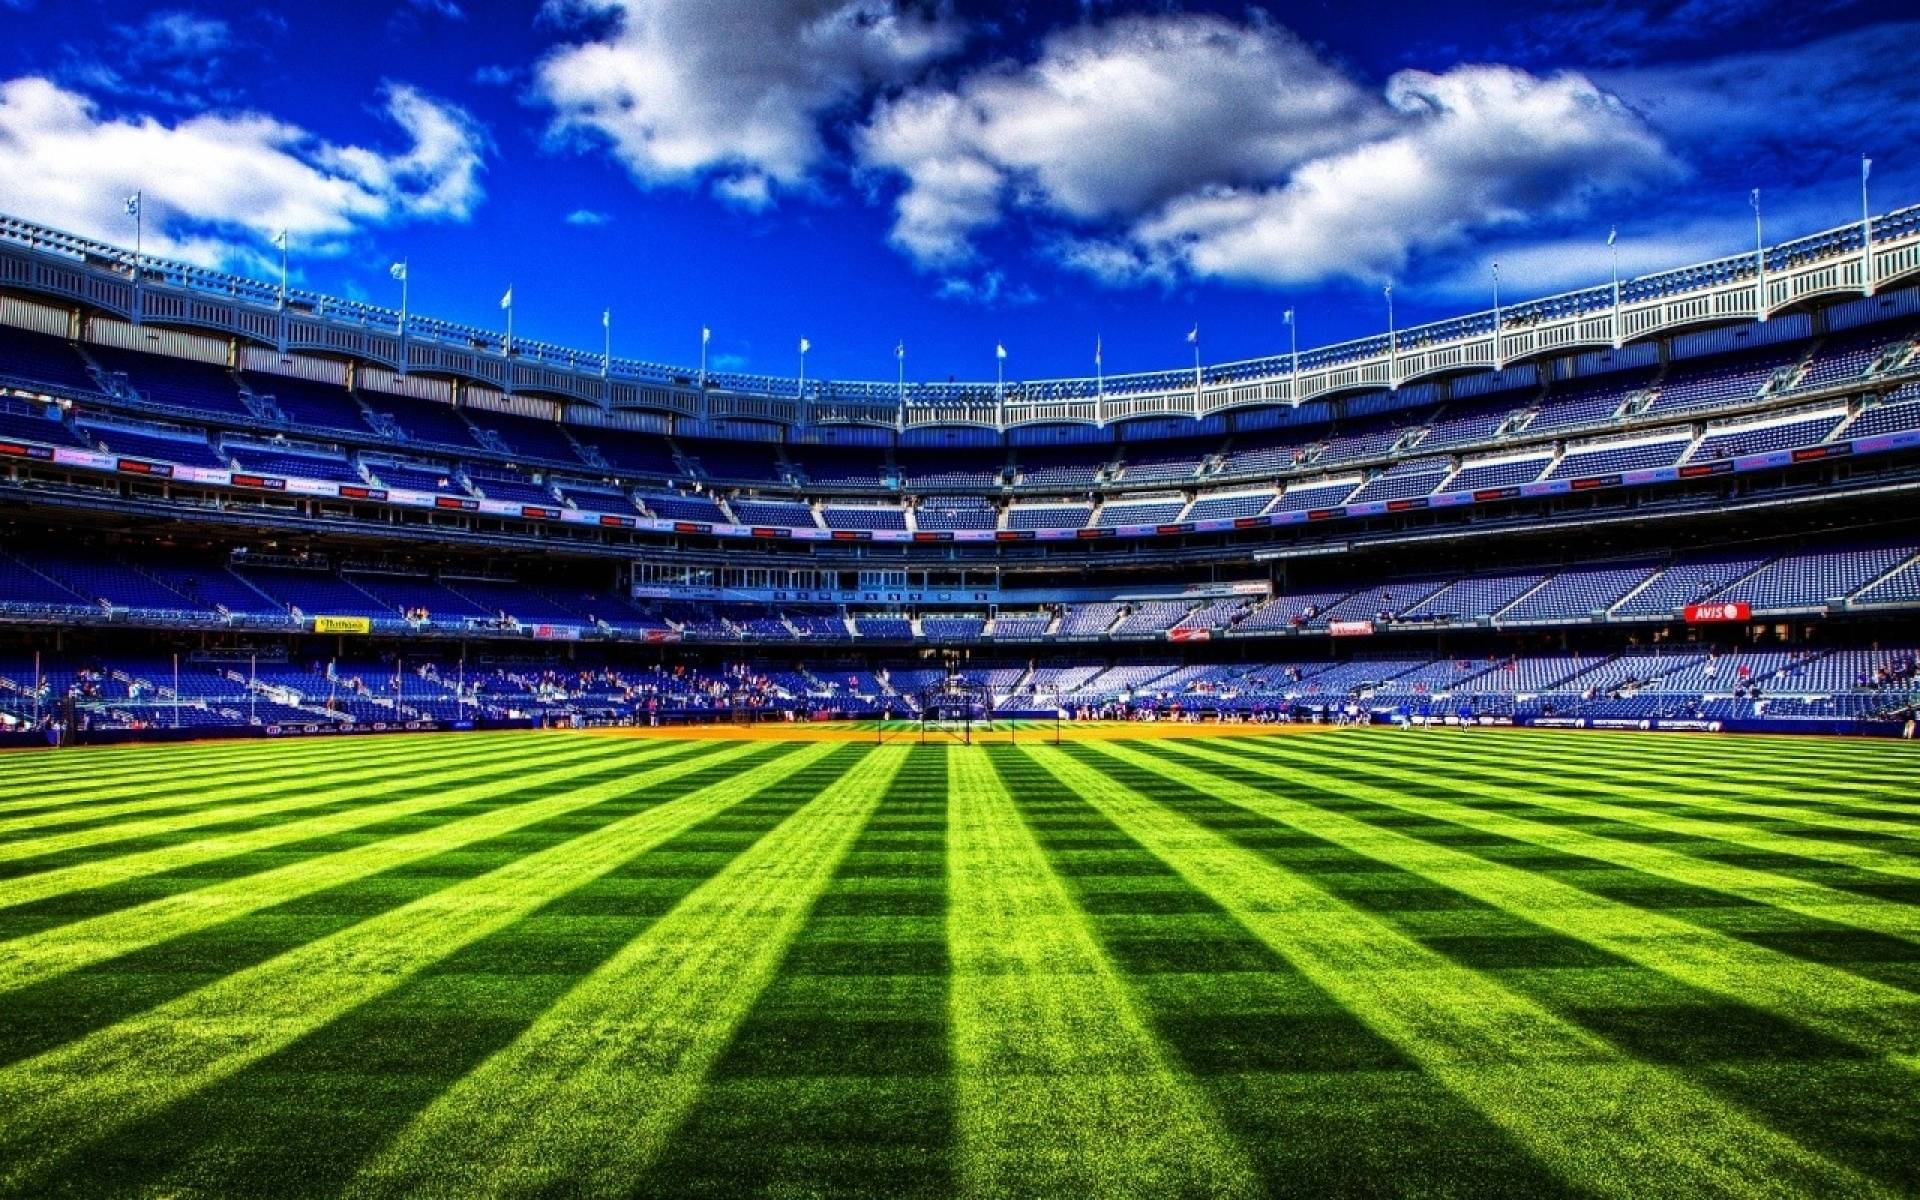 Baseball Stadium 3